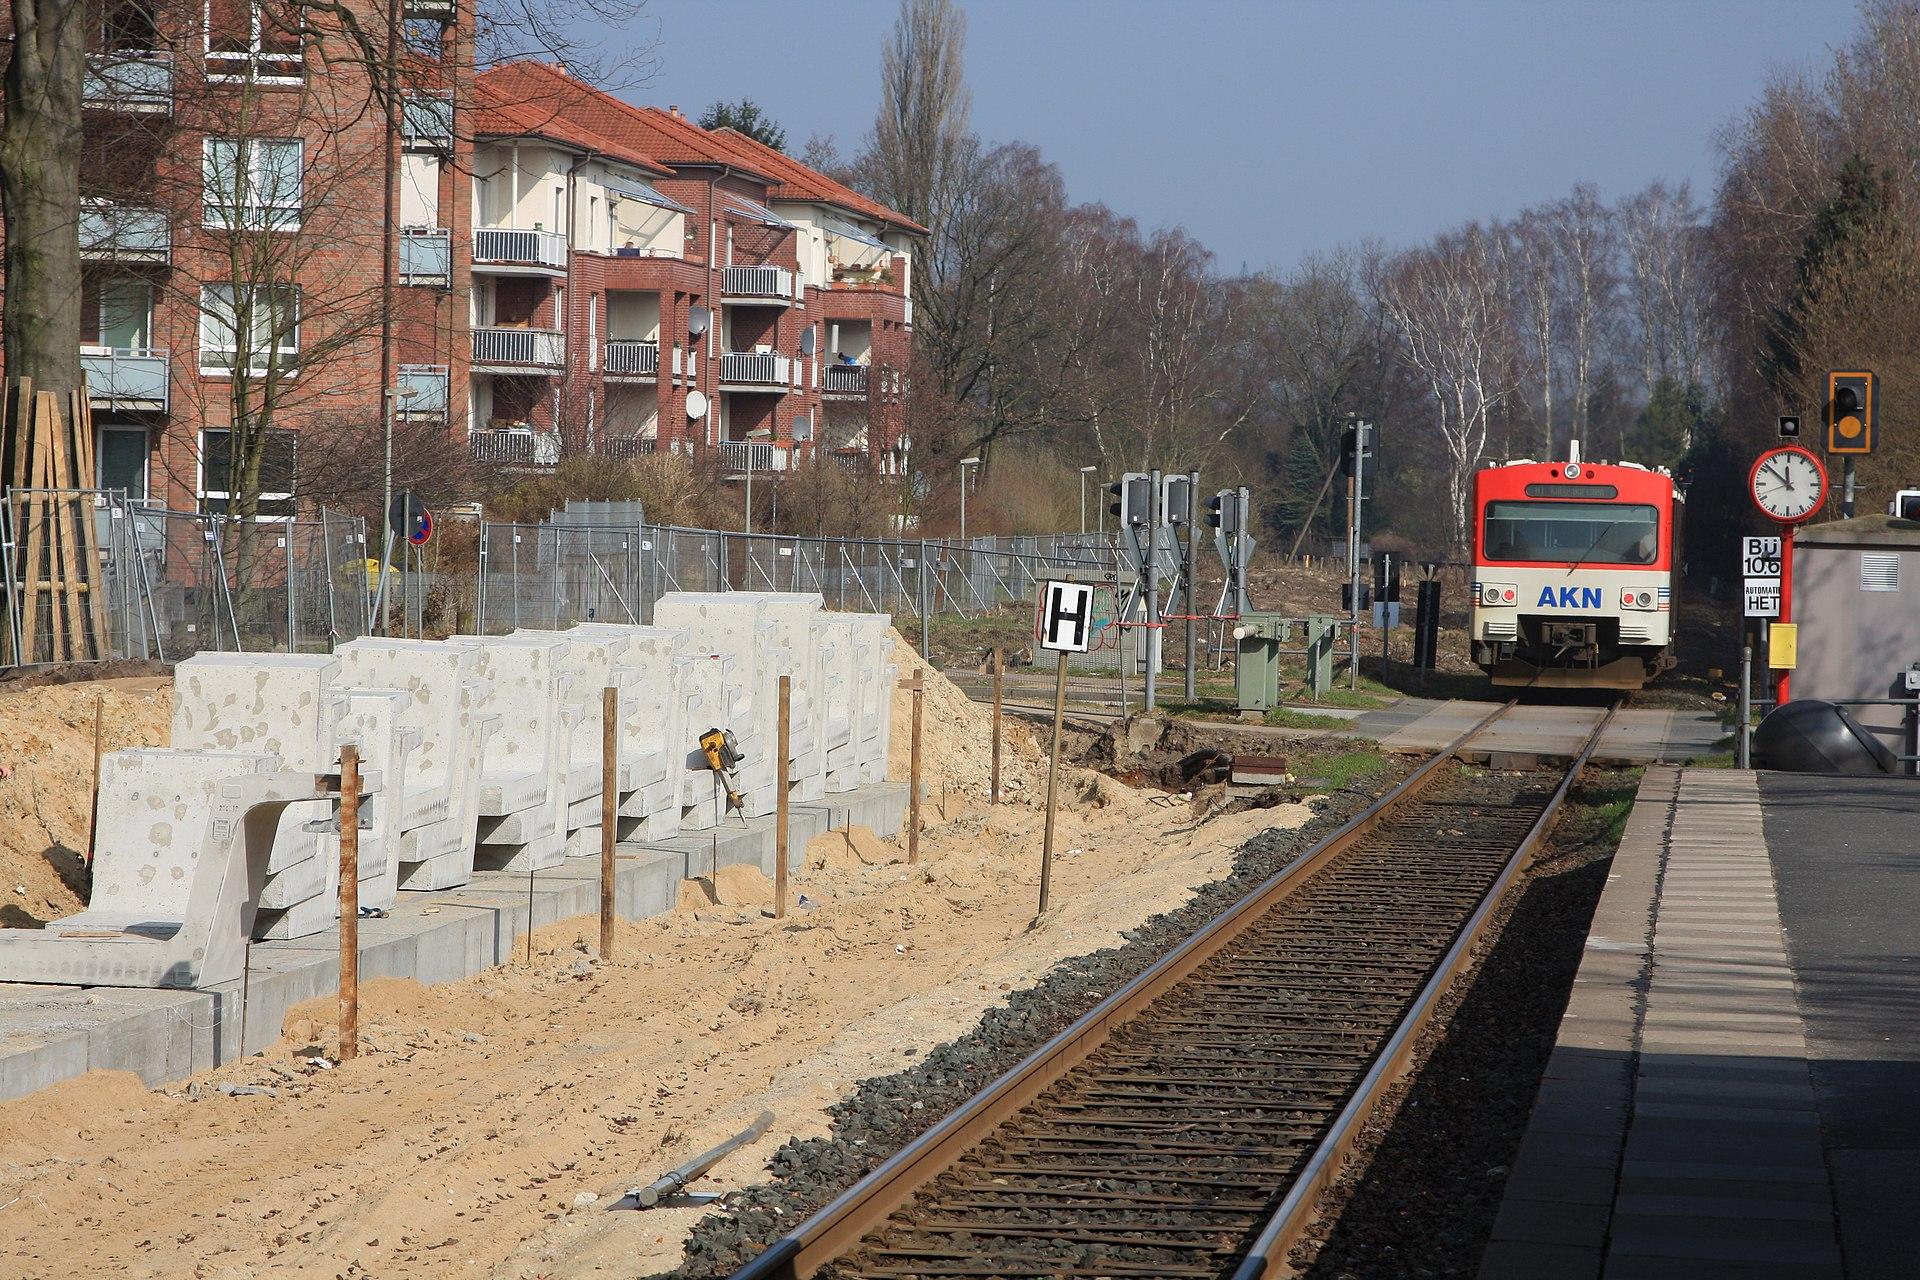 1920px-2012-03-16_AKN_Burgwedel_02.jpg